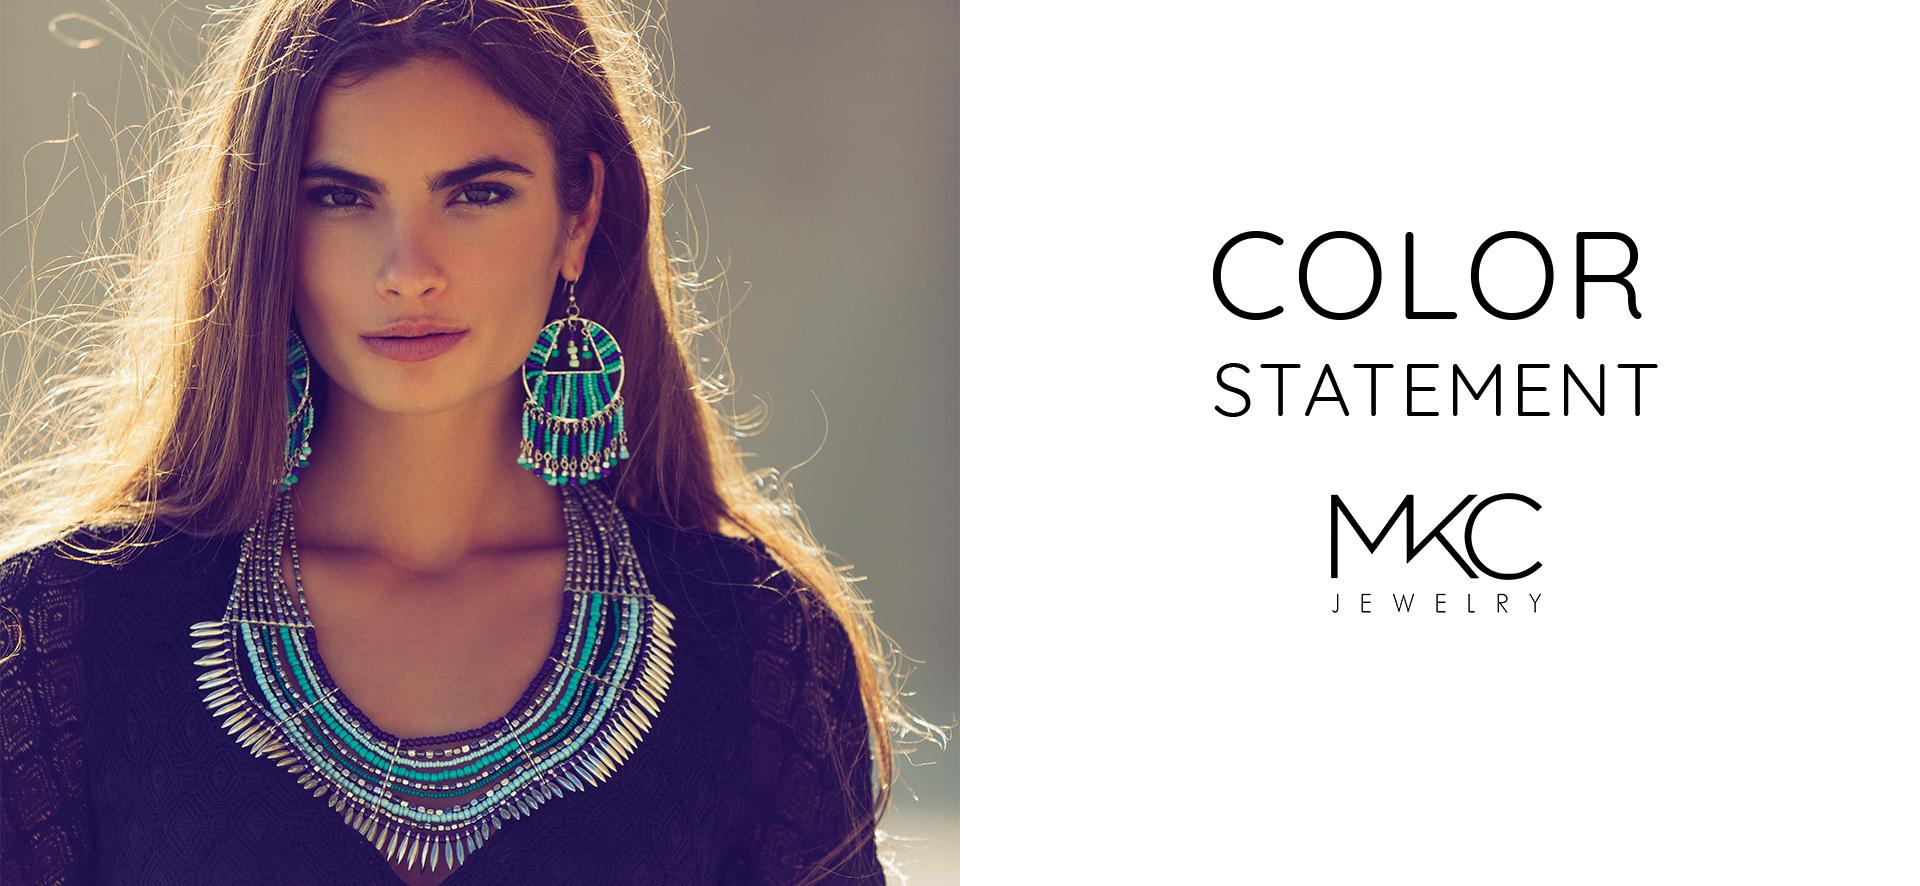 MKC Jewelry